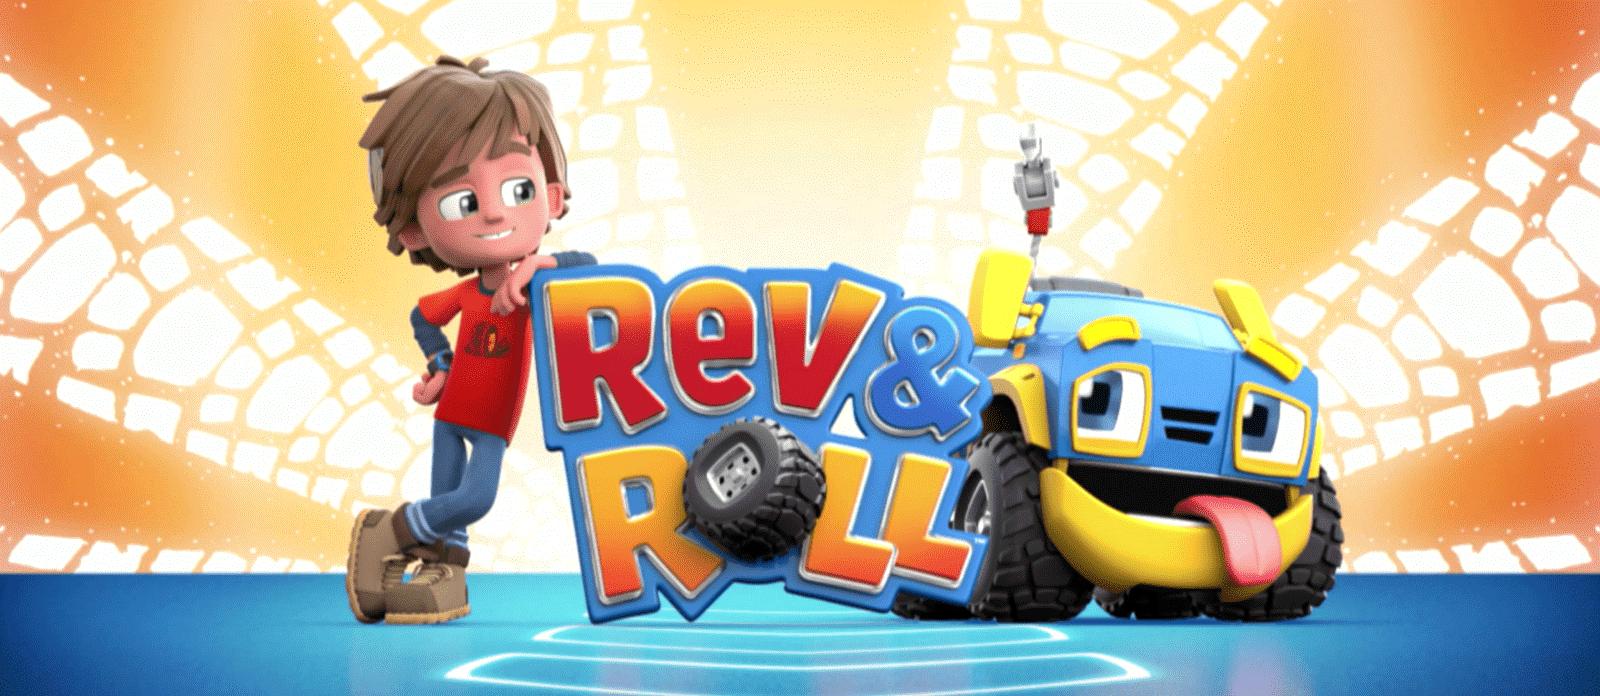 Rev&Roll EU881150 Мини машинка - Типпер